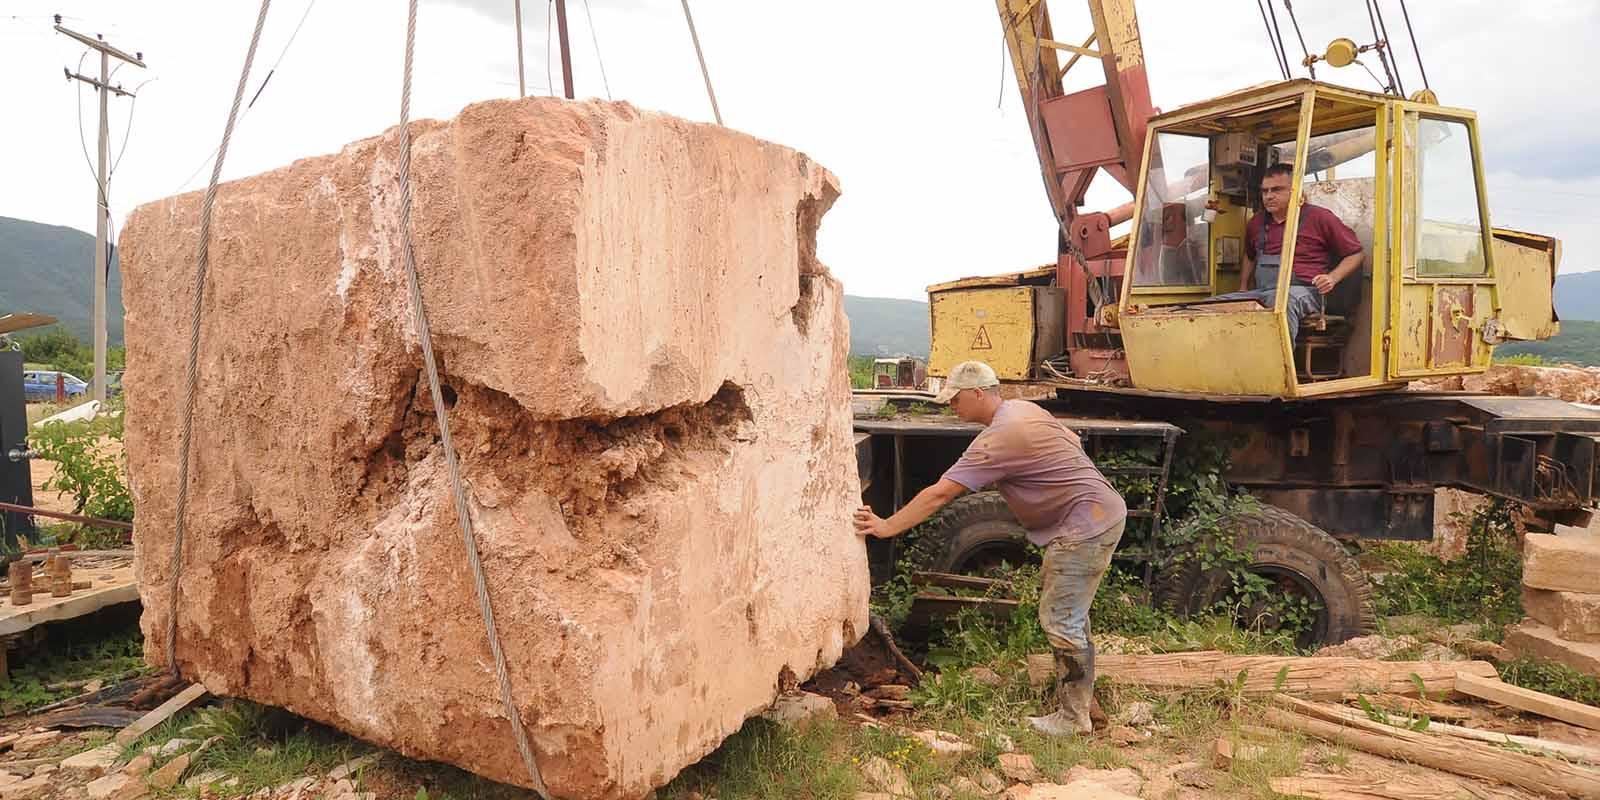 macedonië, the art of living, natuurgevelsteen